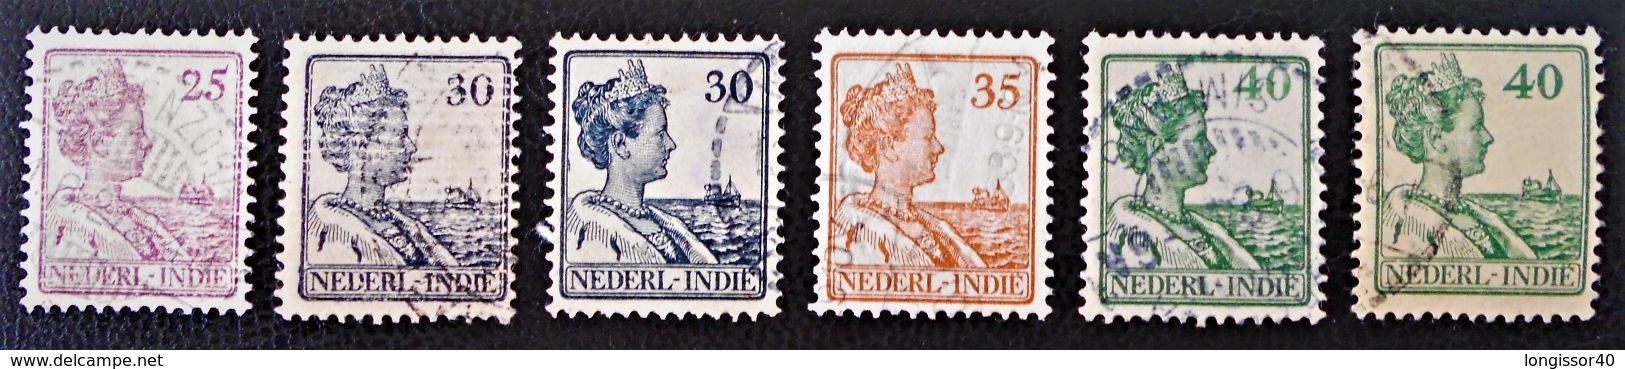 WILHELMINE 1913/14 - OBLITERES - YT 113/14 + 140 + 154 - VARIETES DE TEINTES ET D'OBLITERATIONS - Niederländisch-Indien